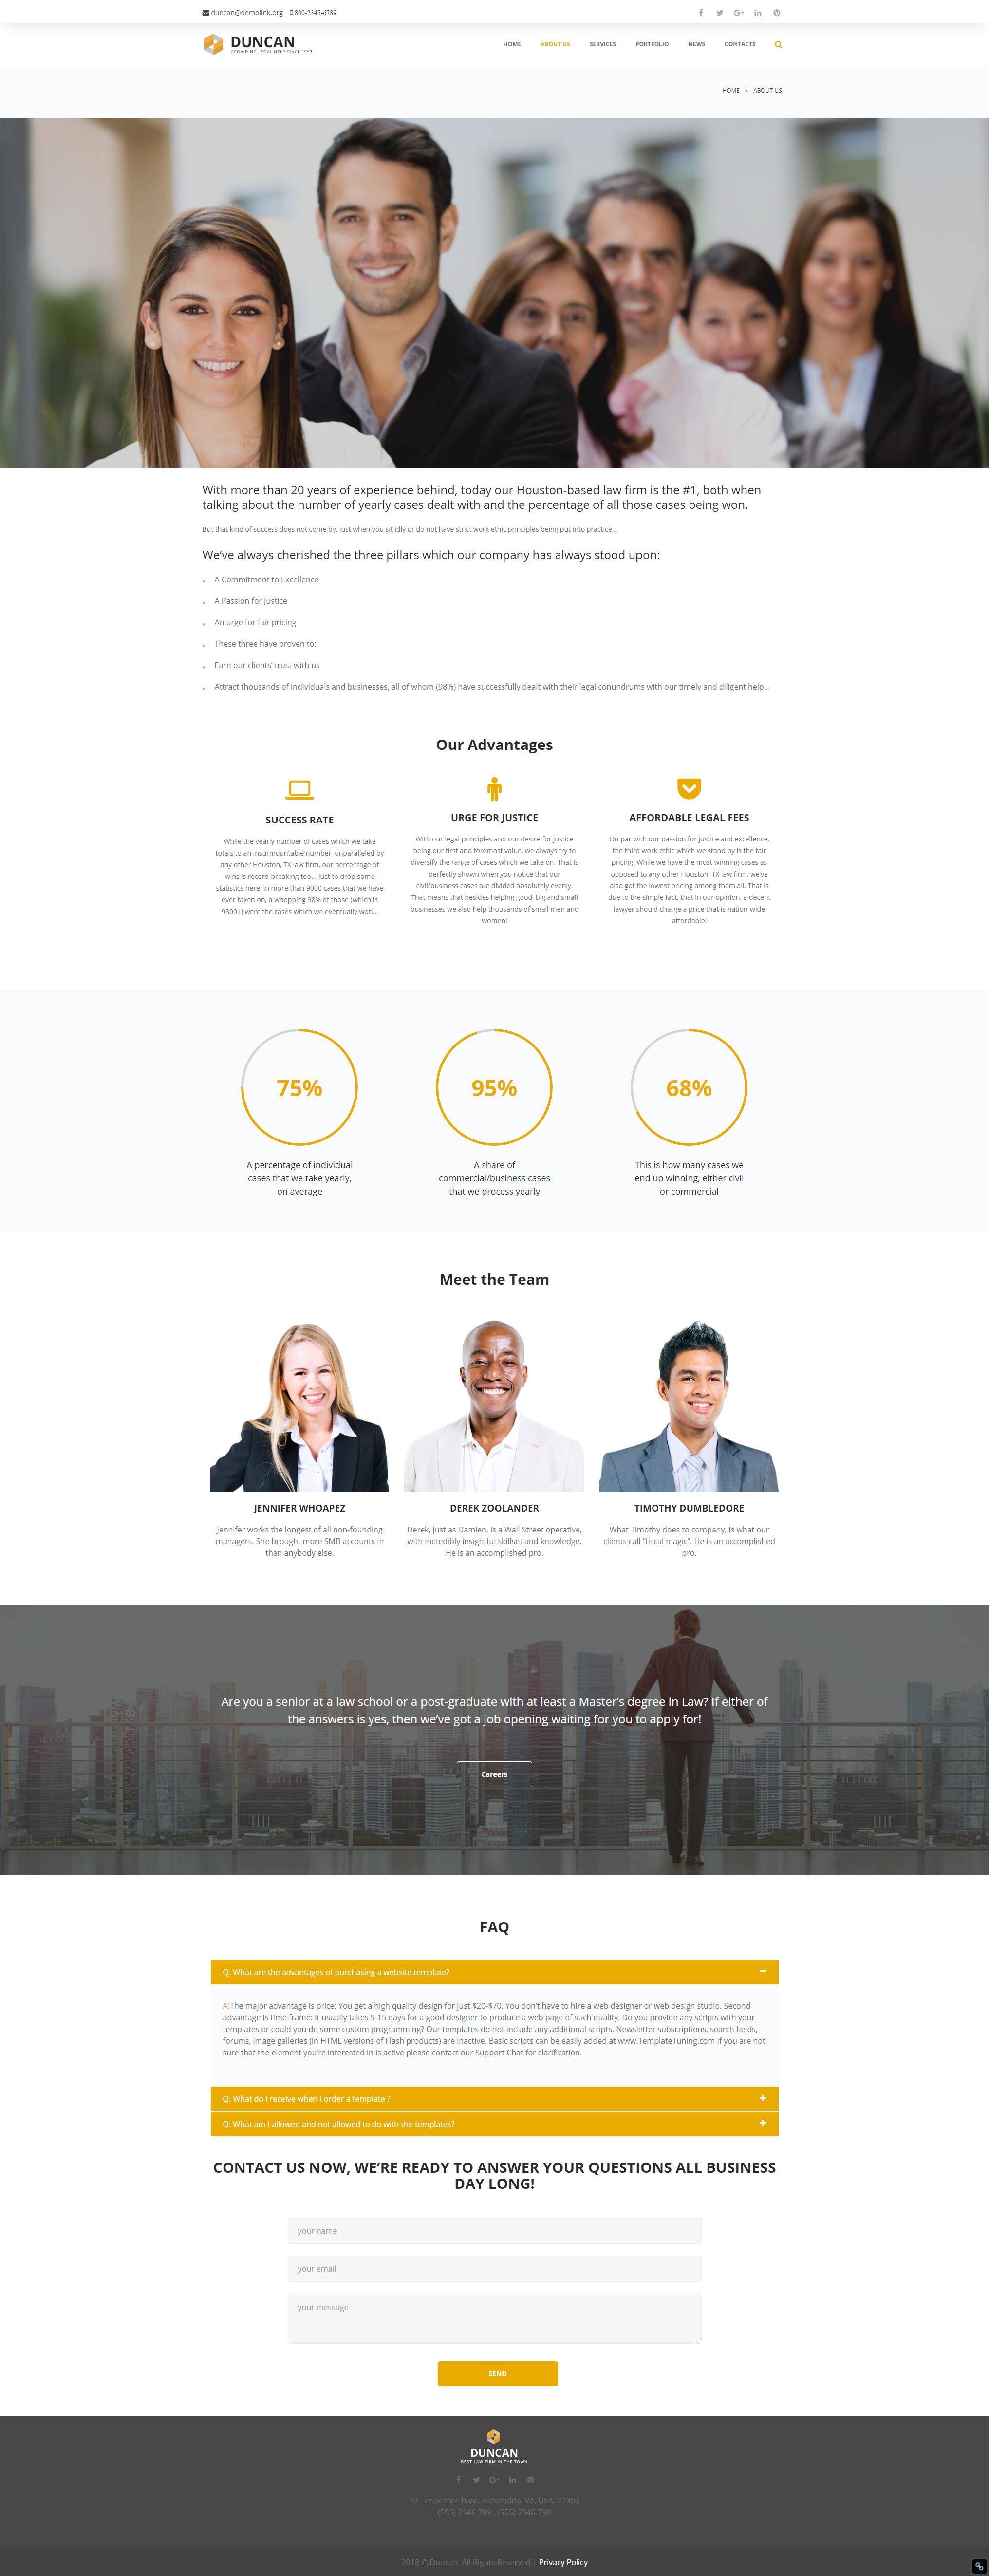 About us - Best Lawyer WordPress Theme